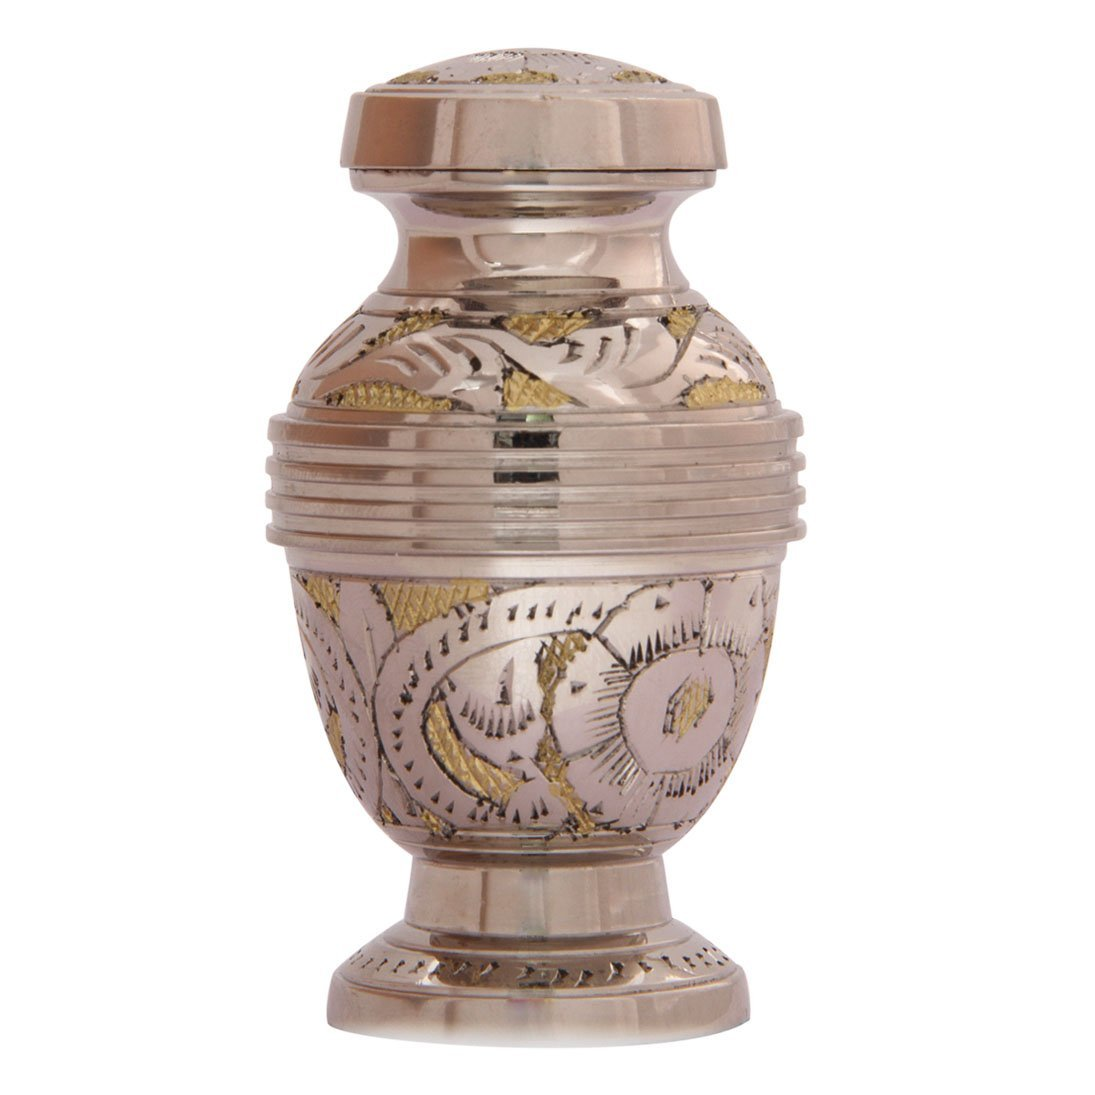 Cheap flower urns outdoors find flower urns outdoors deals on line get quotations silver flower engraved golden keepsake urn small cremation urns ashes izmirmasajfo